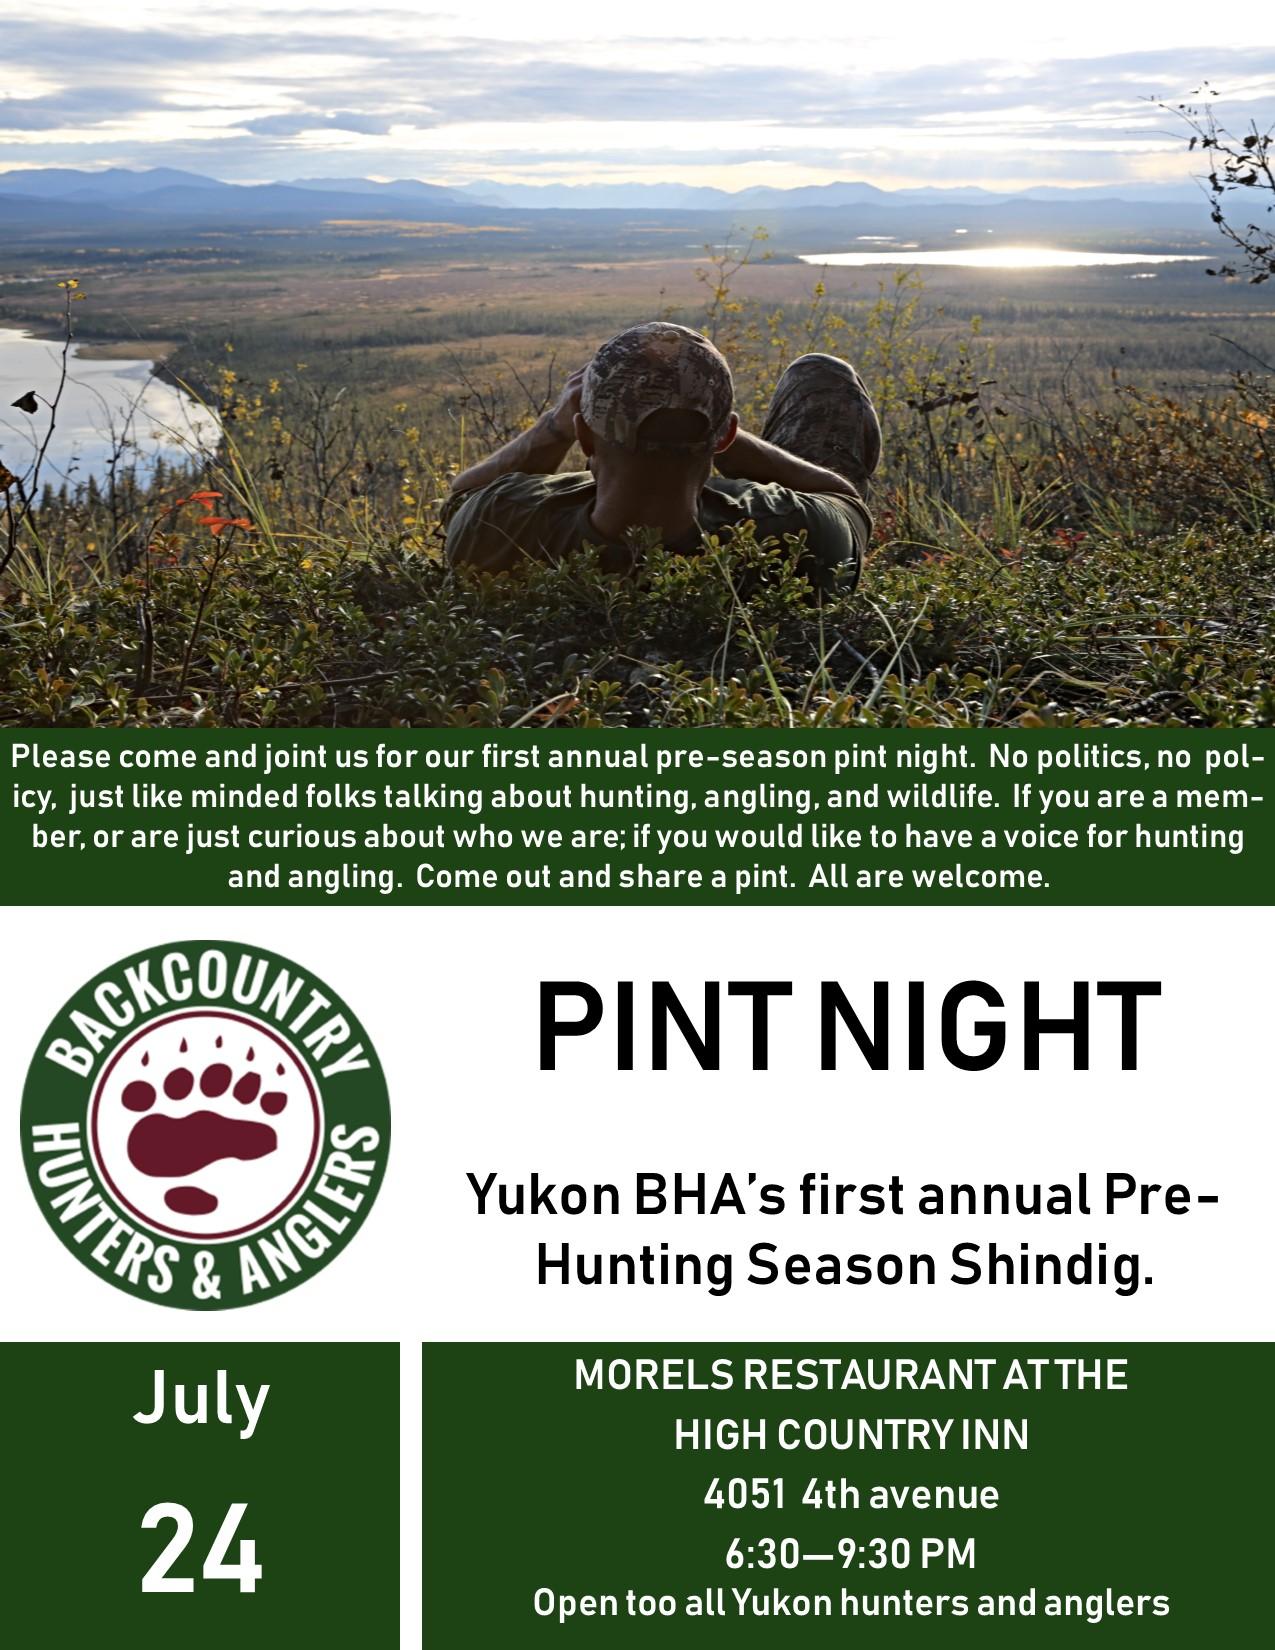 pint_night_july_24_pre_season_party_poster_jpeg.jpg